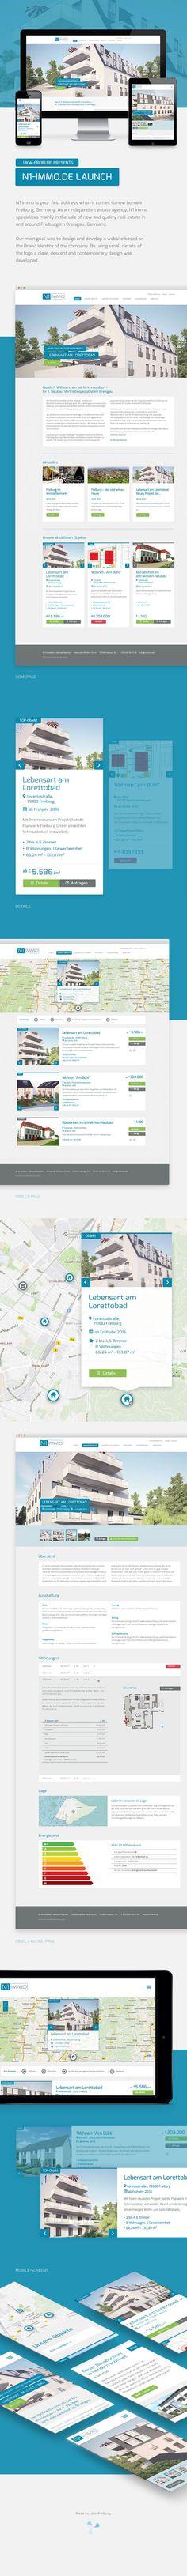 Website Design for Real Estate Company N1 Immobilien in Freiburg.   by www.ukw-freiburg.de  #WebDesign #Website #ukwfreiburg